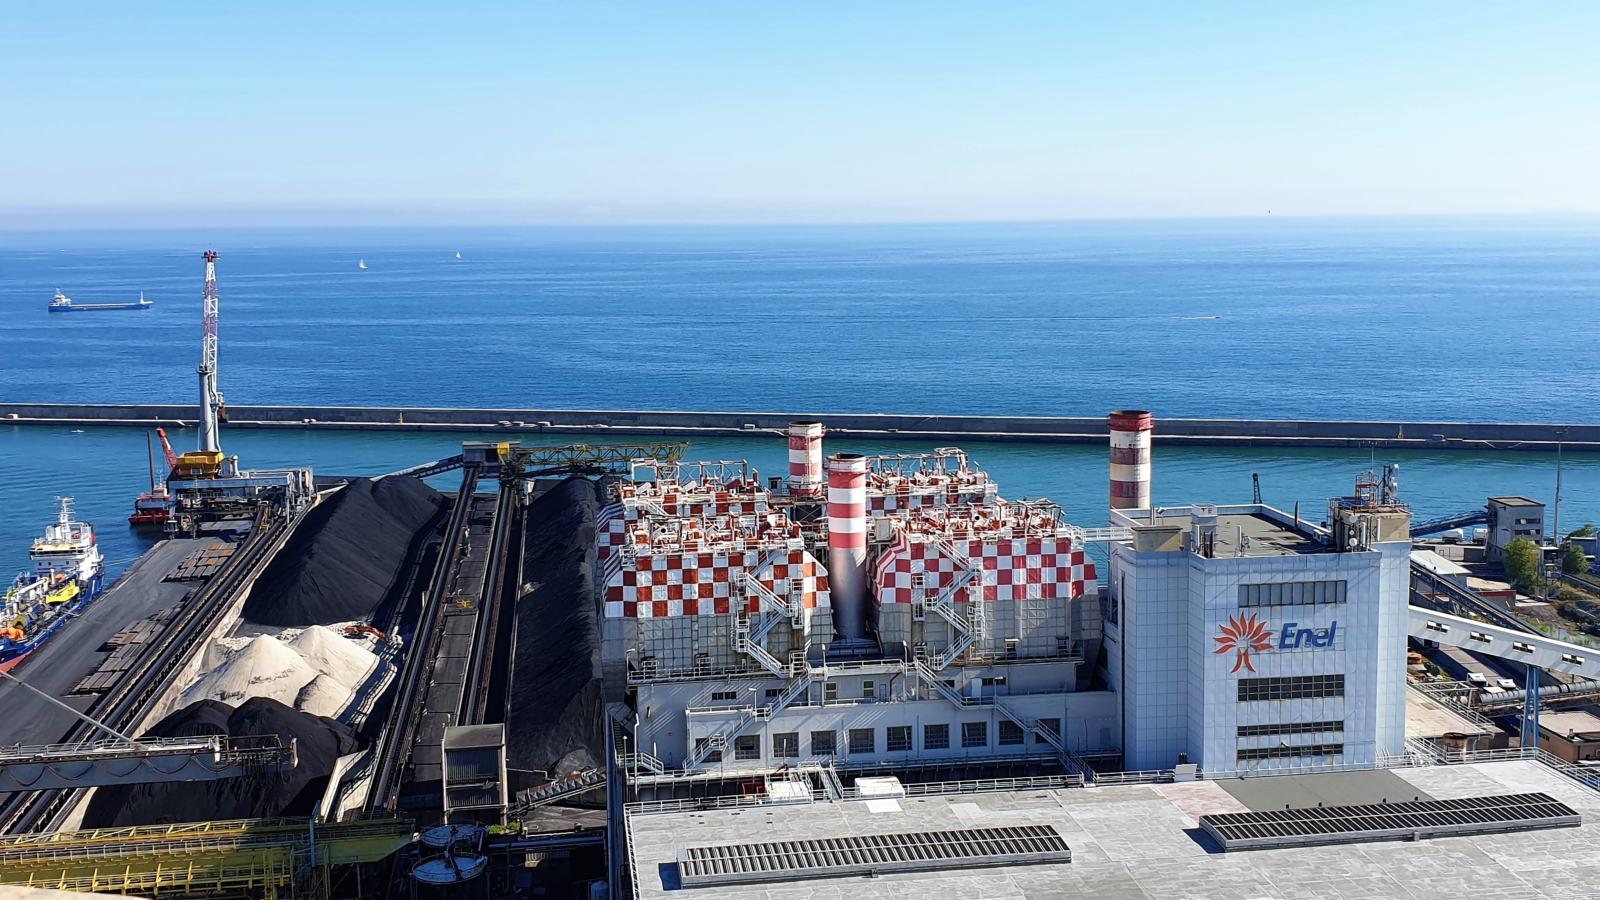 Centrale Elettrica Genova